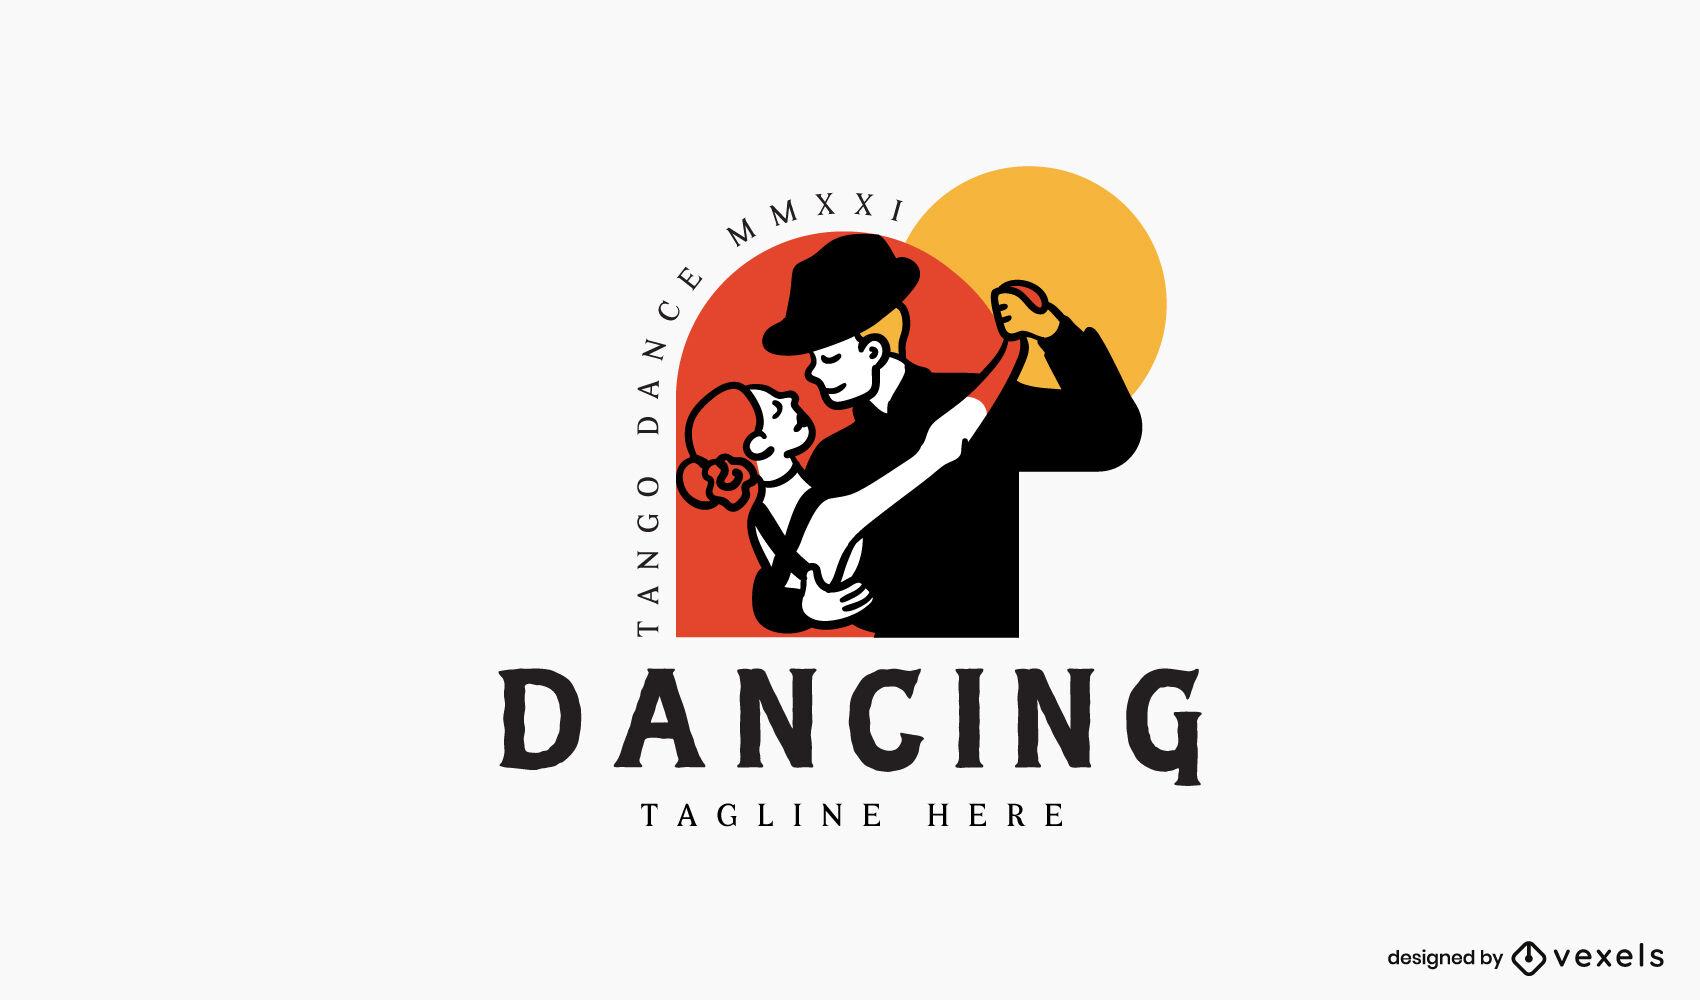 Tango dancing couple logo design